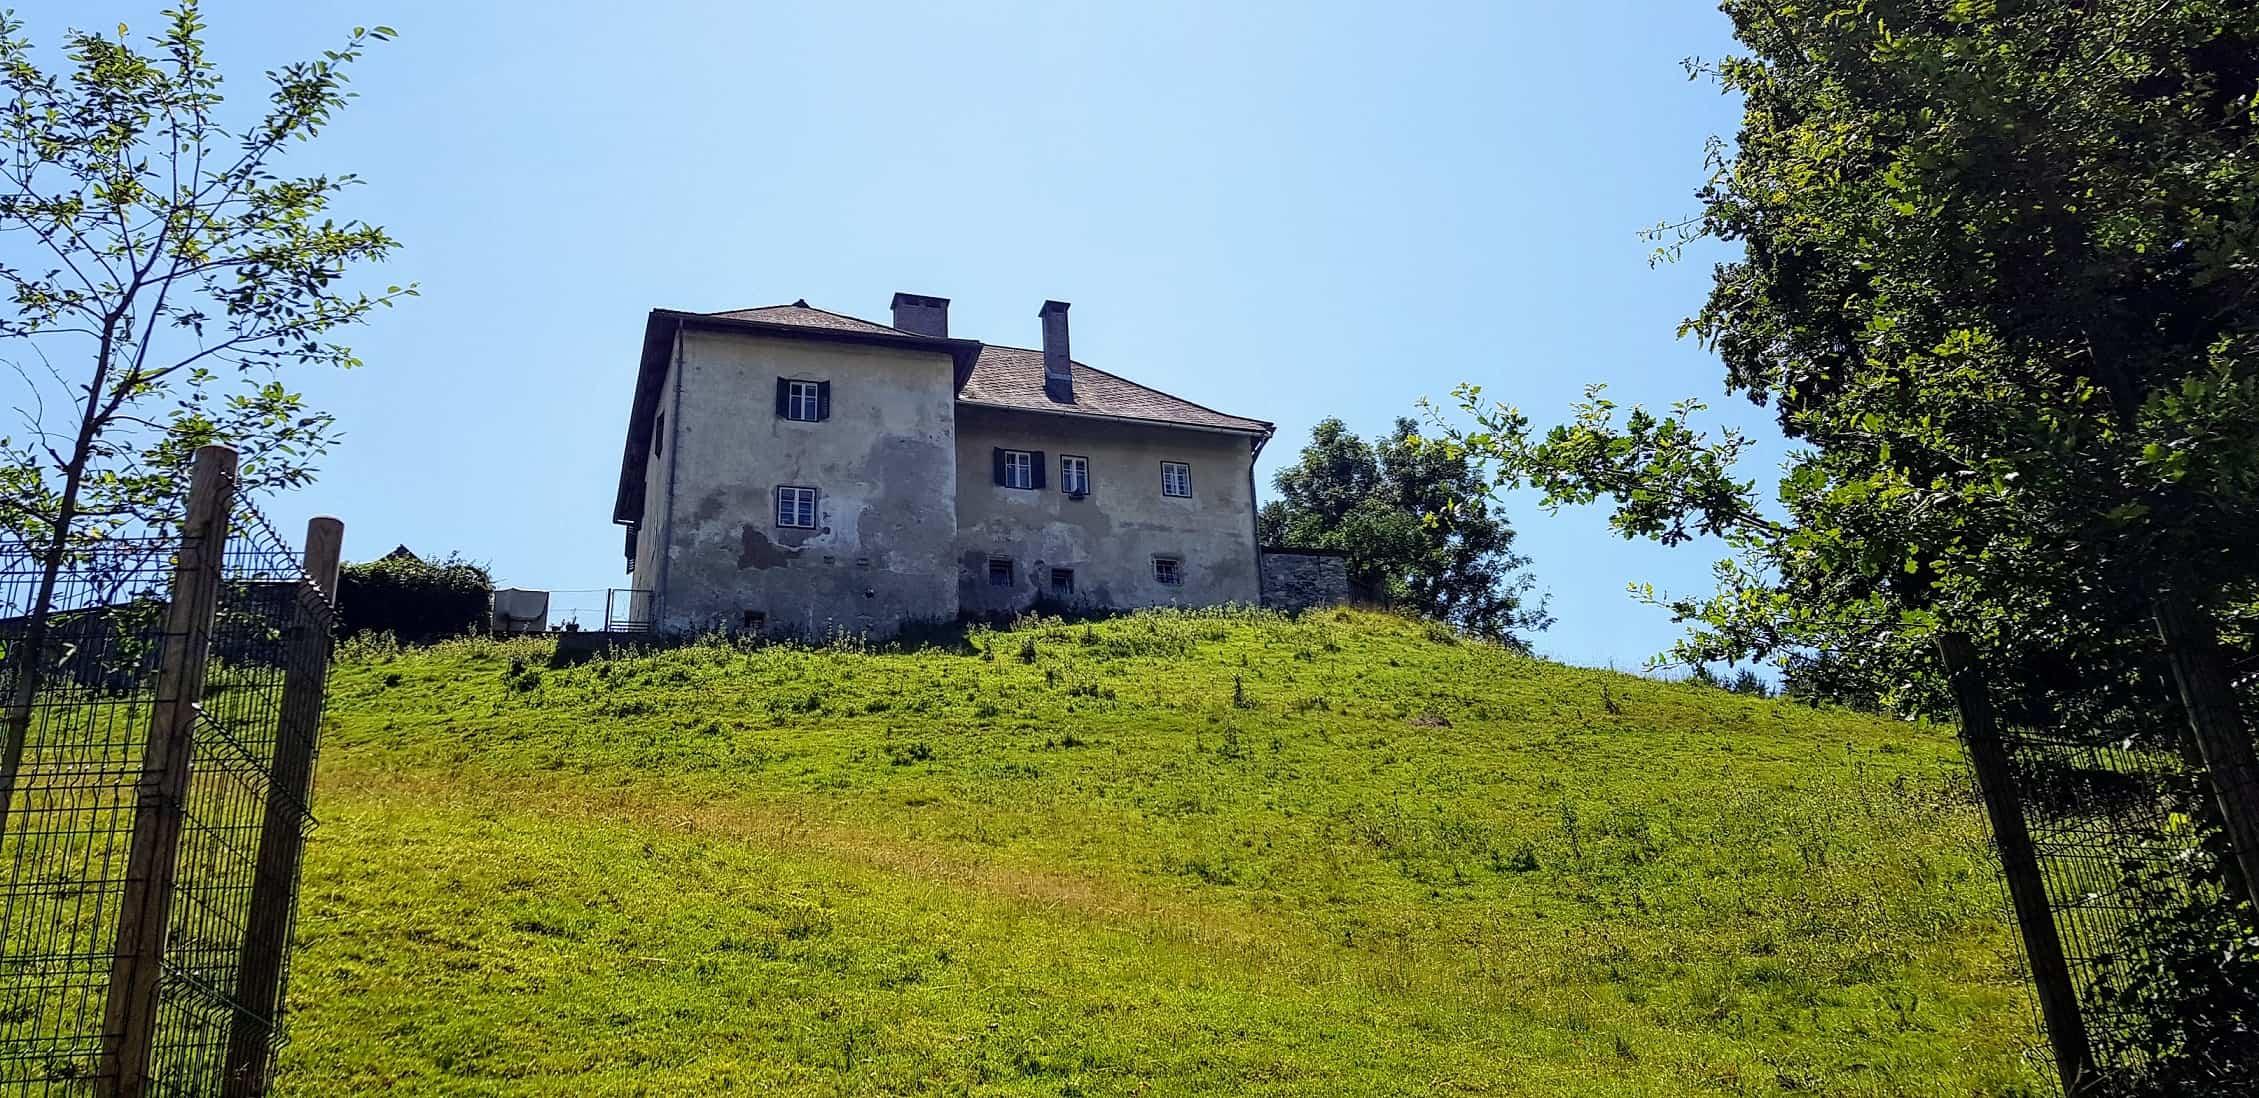 Ruine bei Wanderung durch Tierpark Rosegg Kärnten